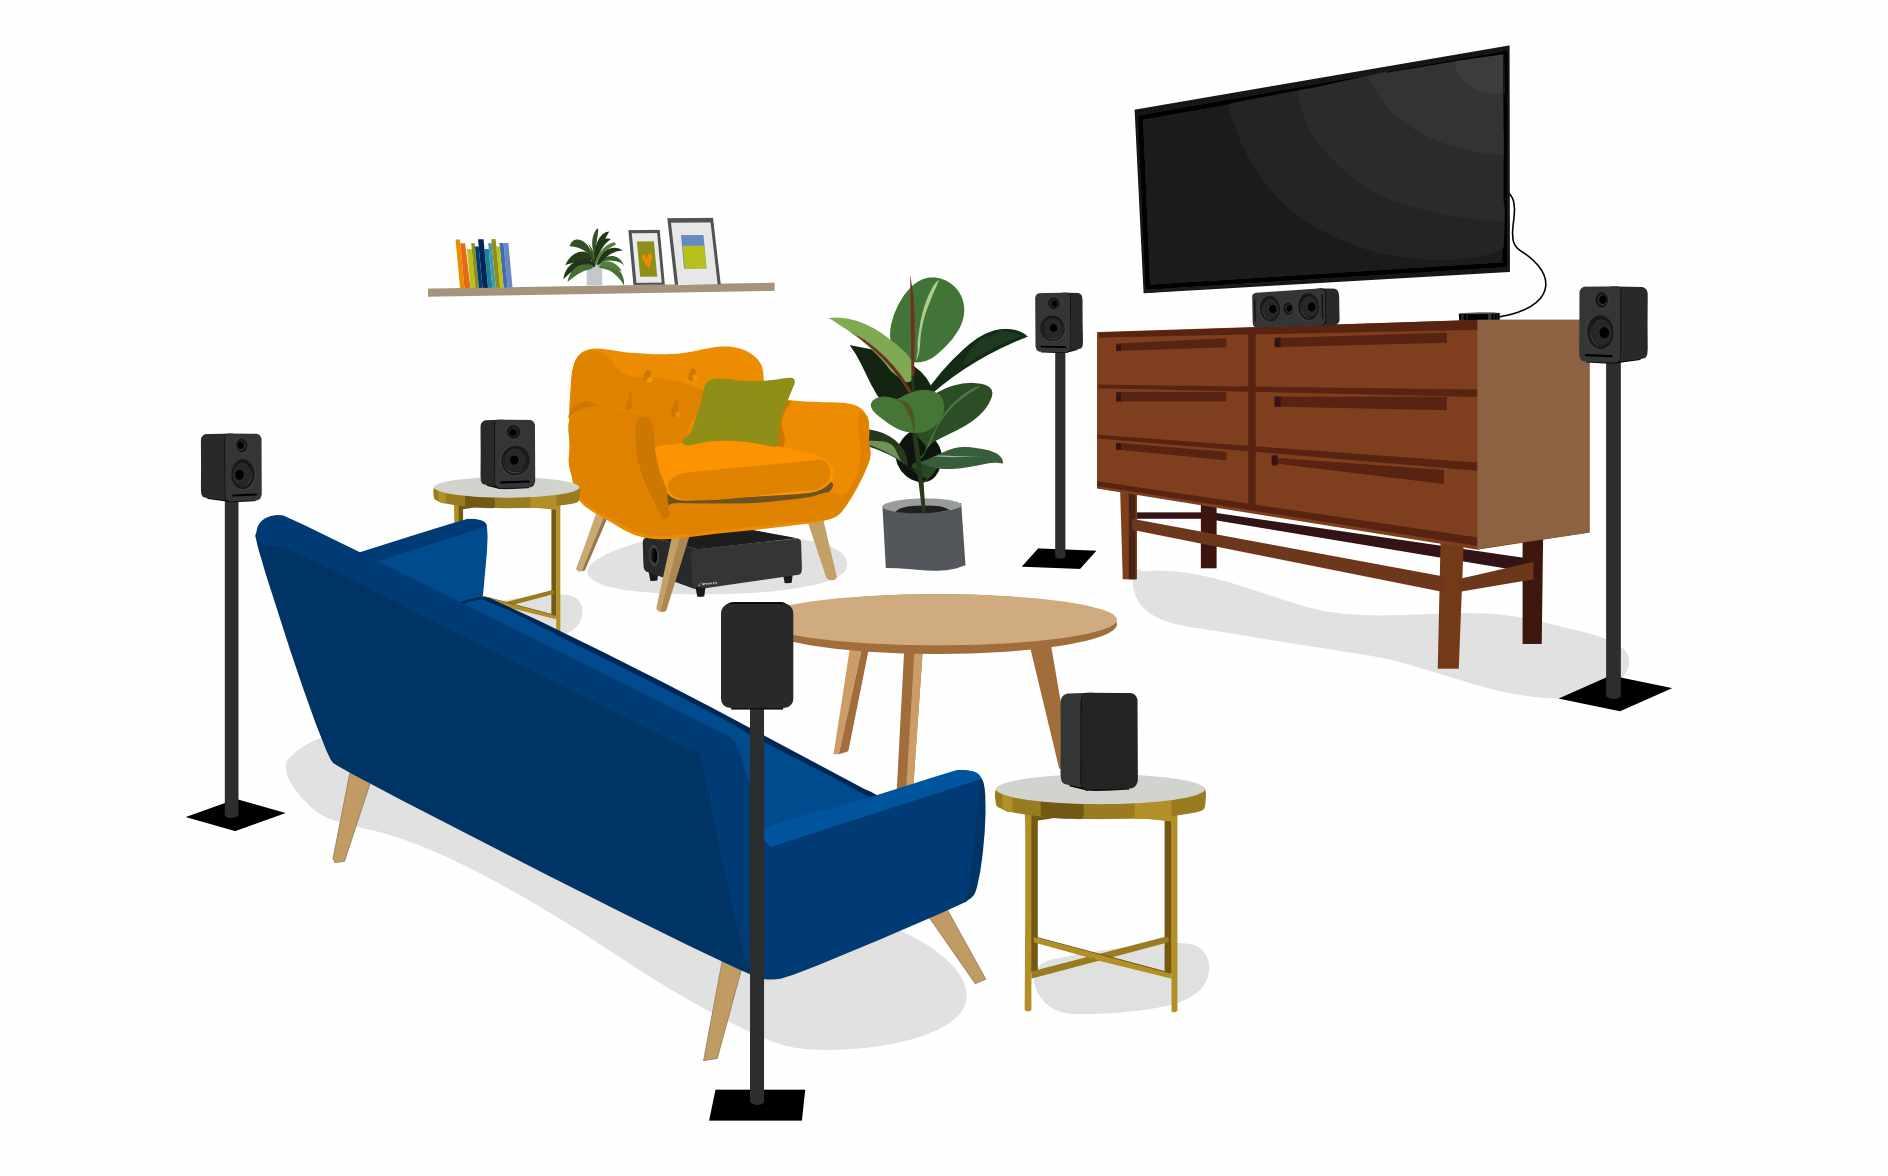 a cartoon living room full of Platin speakers